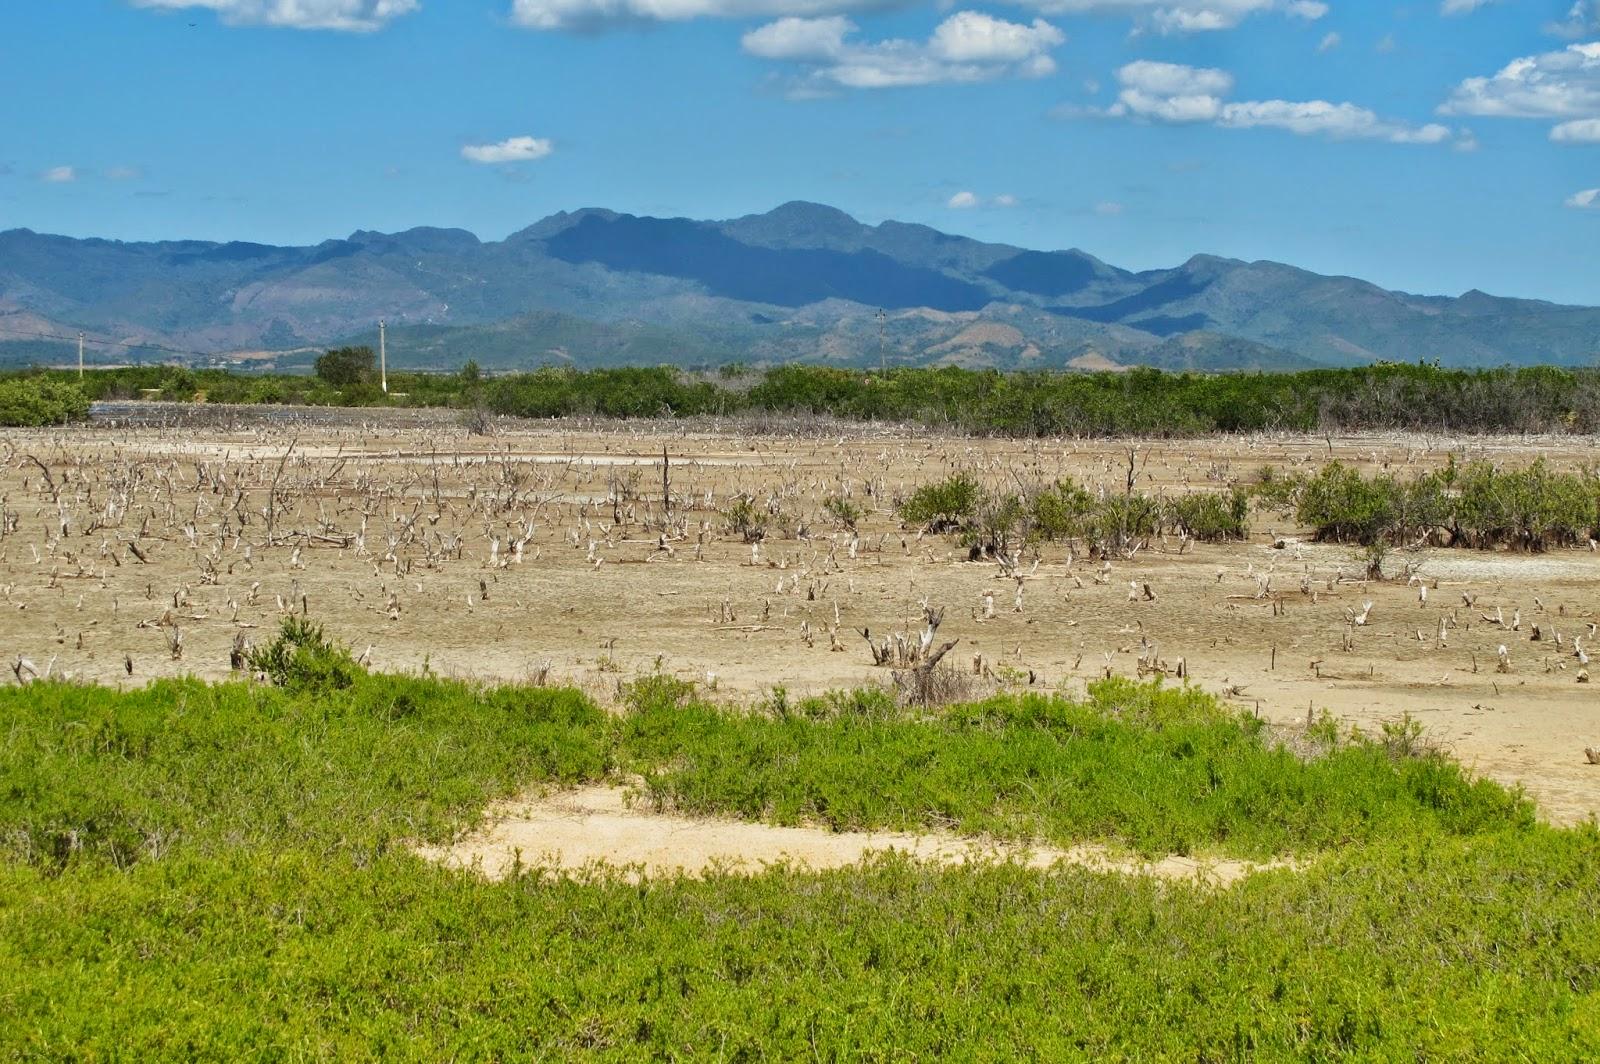 Mangue seco na Península Áncon, no Caribe de Cuba.